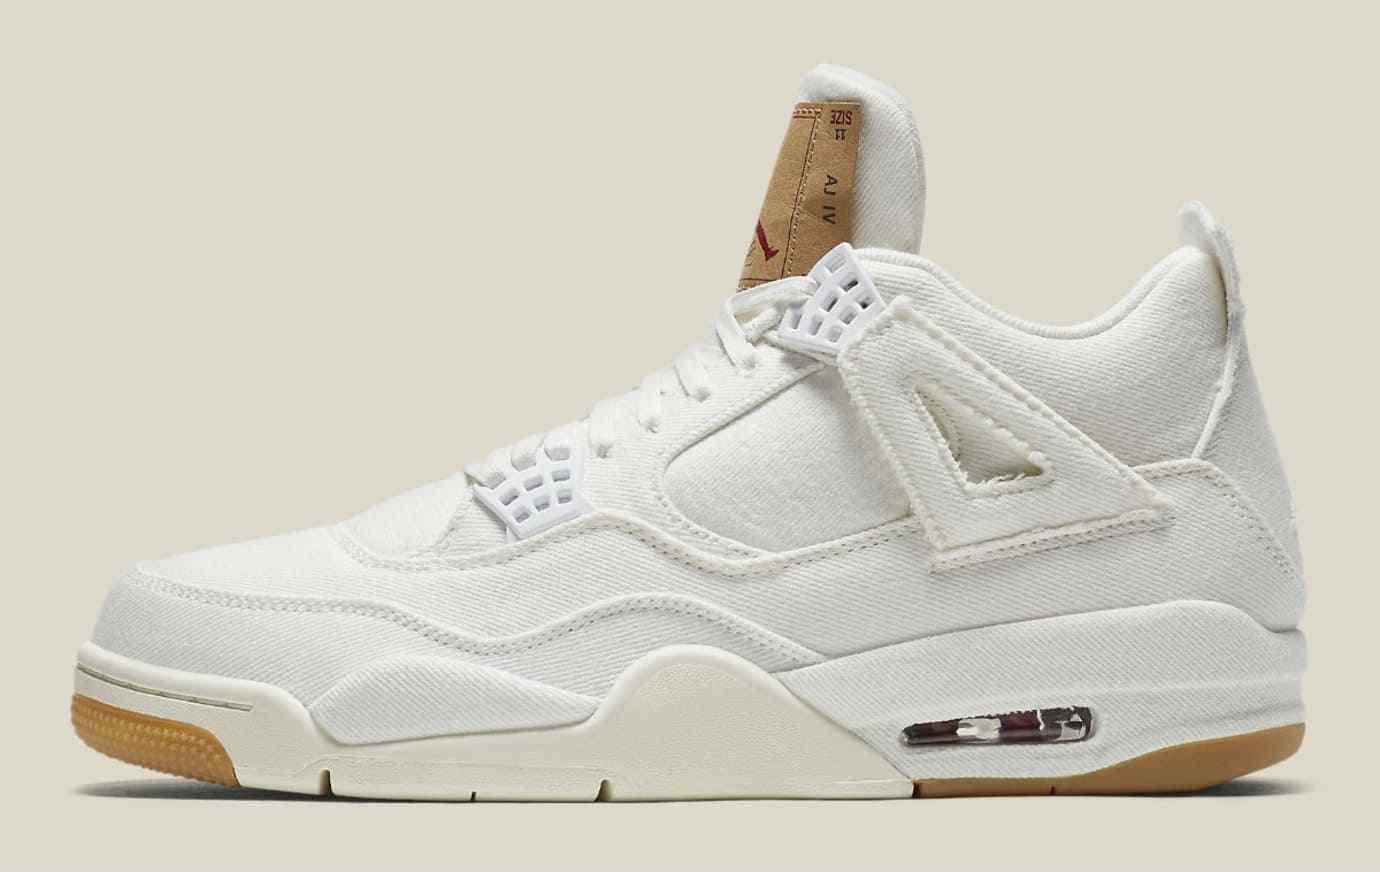 57aadcd0d50 Levi's X Air Jordan 4 Retro Sneakers NRG White Denim Shoes AO2571-100 Size  11.5